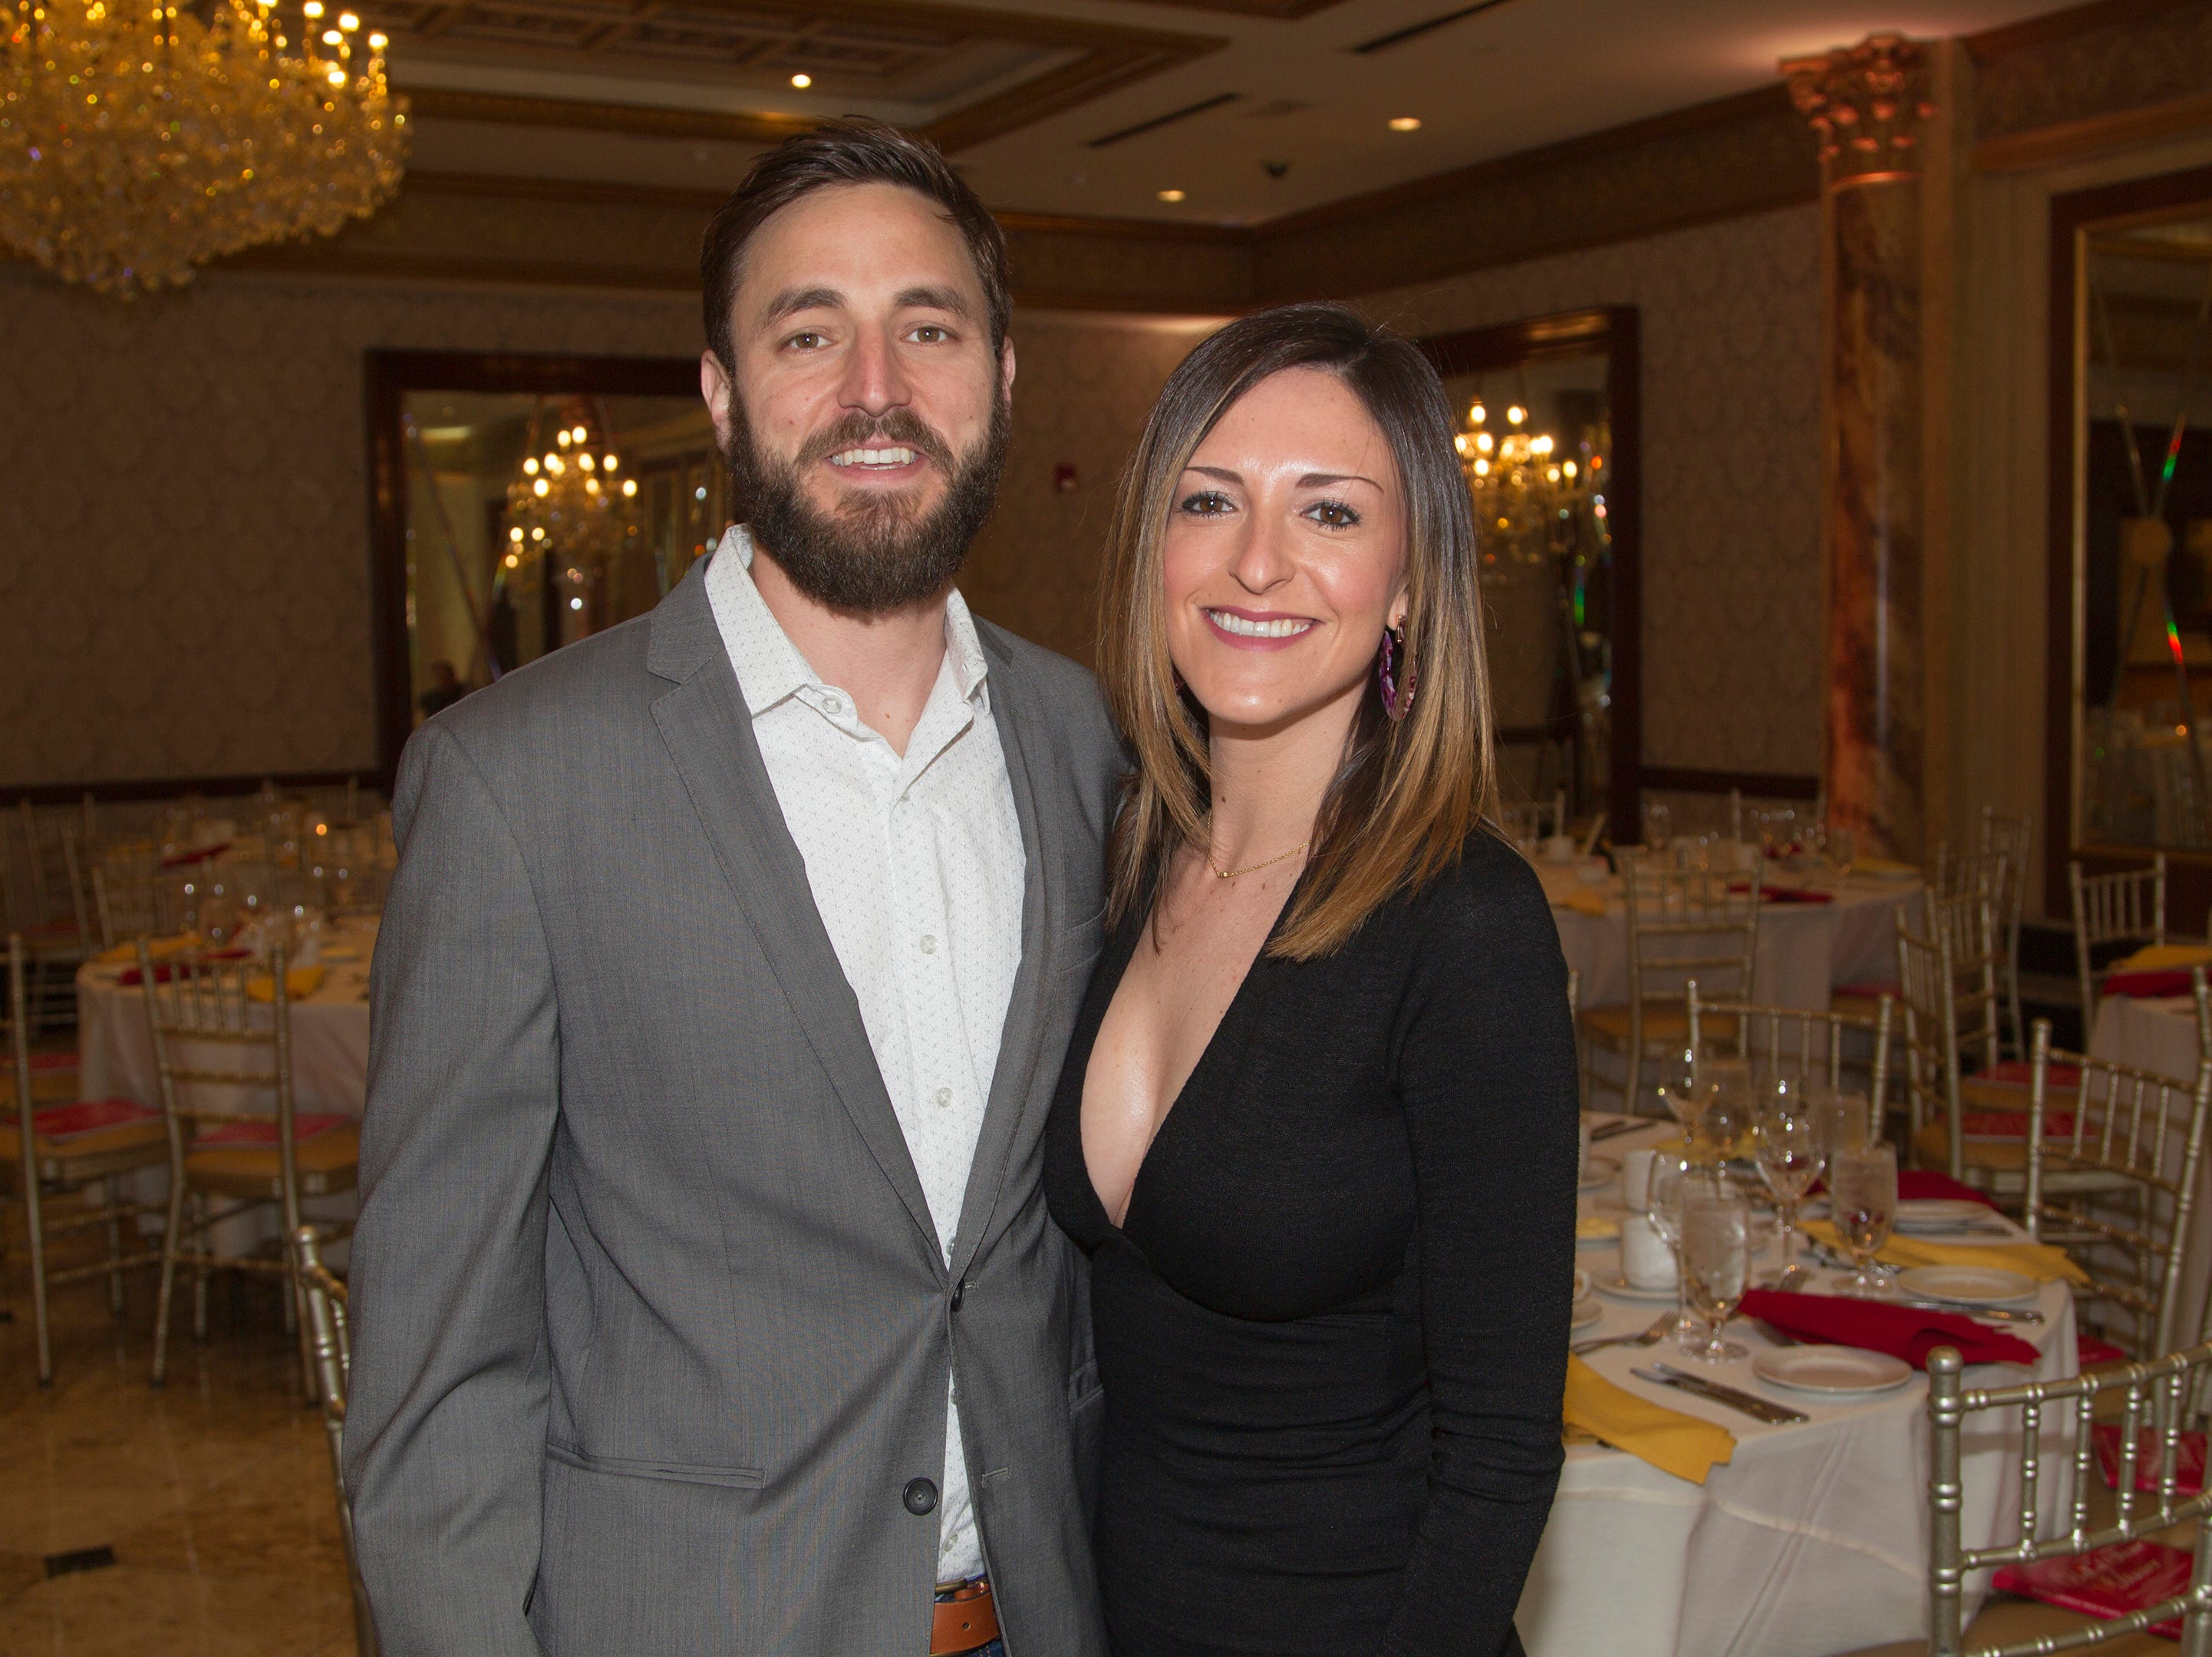 Colin Lamond, Jenna Silberfeld. Bergen Catholic High School Hall of Fame Dinner at Seasons in Washington Twp. 03/31/2019